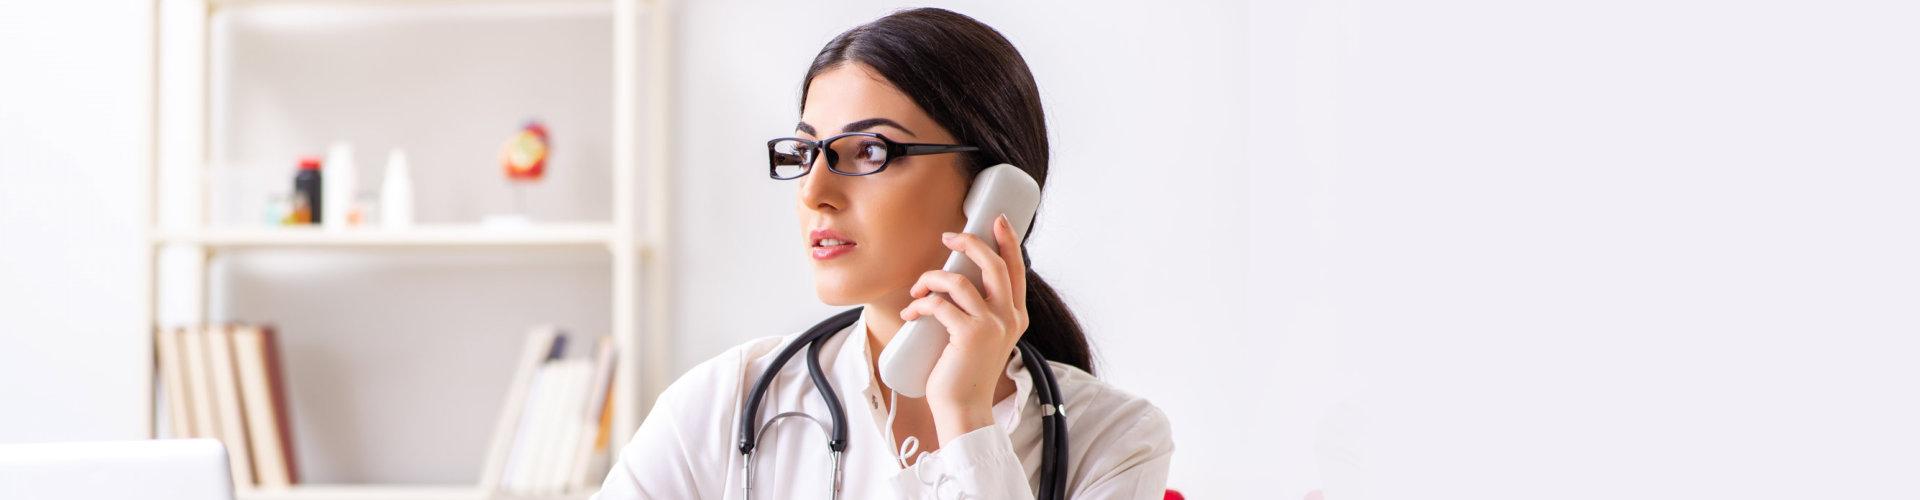 female doctor taking call